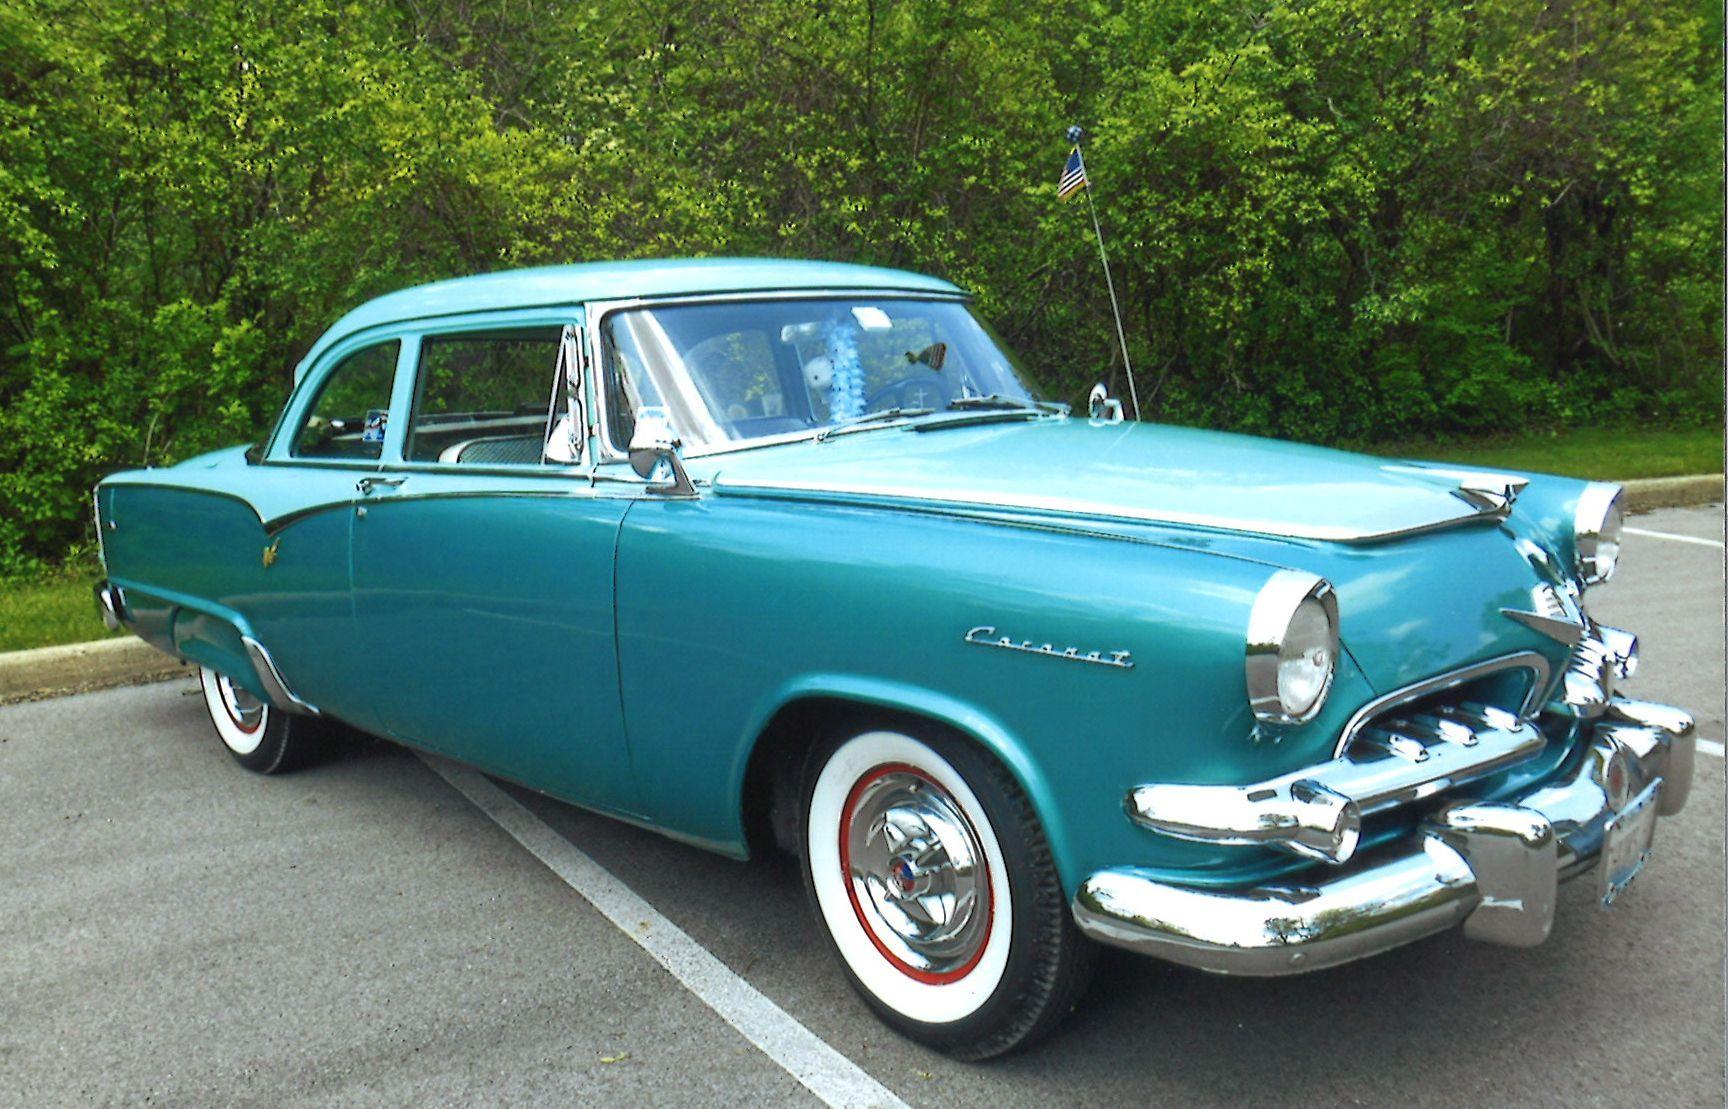 1955 dodge custom royal lancer 4 door sedan 15699 - 1955 Dodge Coronet For Sale 1955 Dodge Cars Pinterest Dodge Coronet And Cars